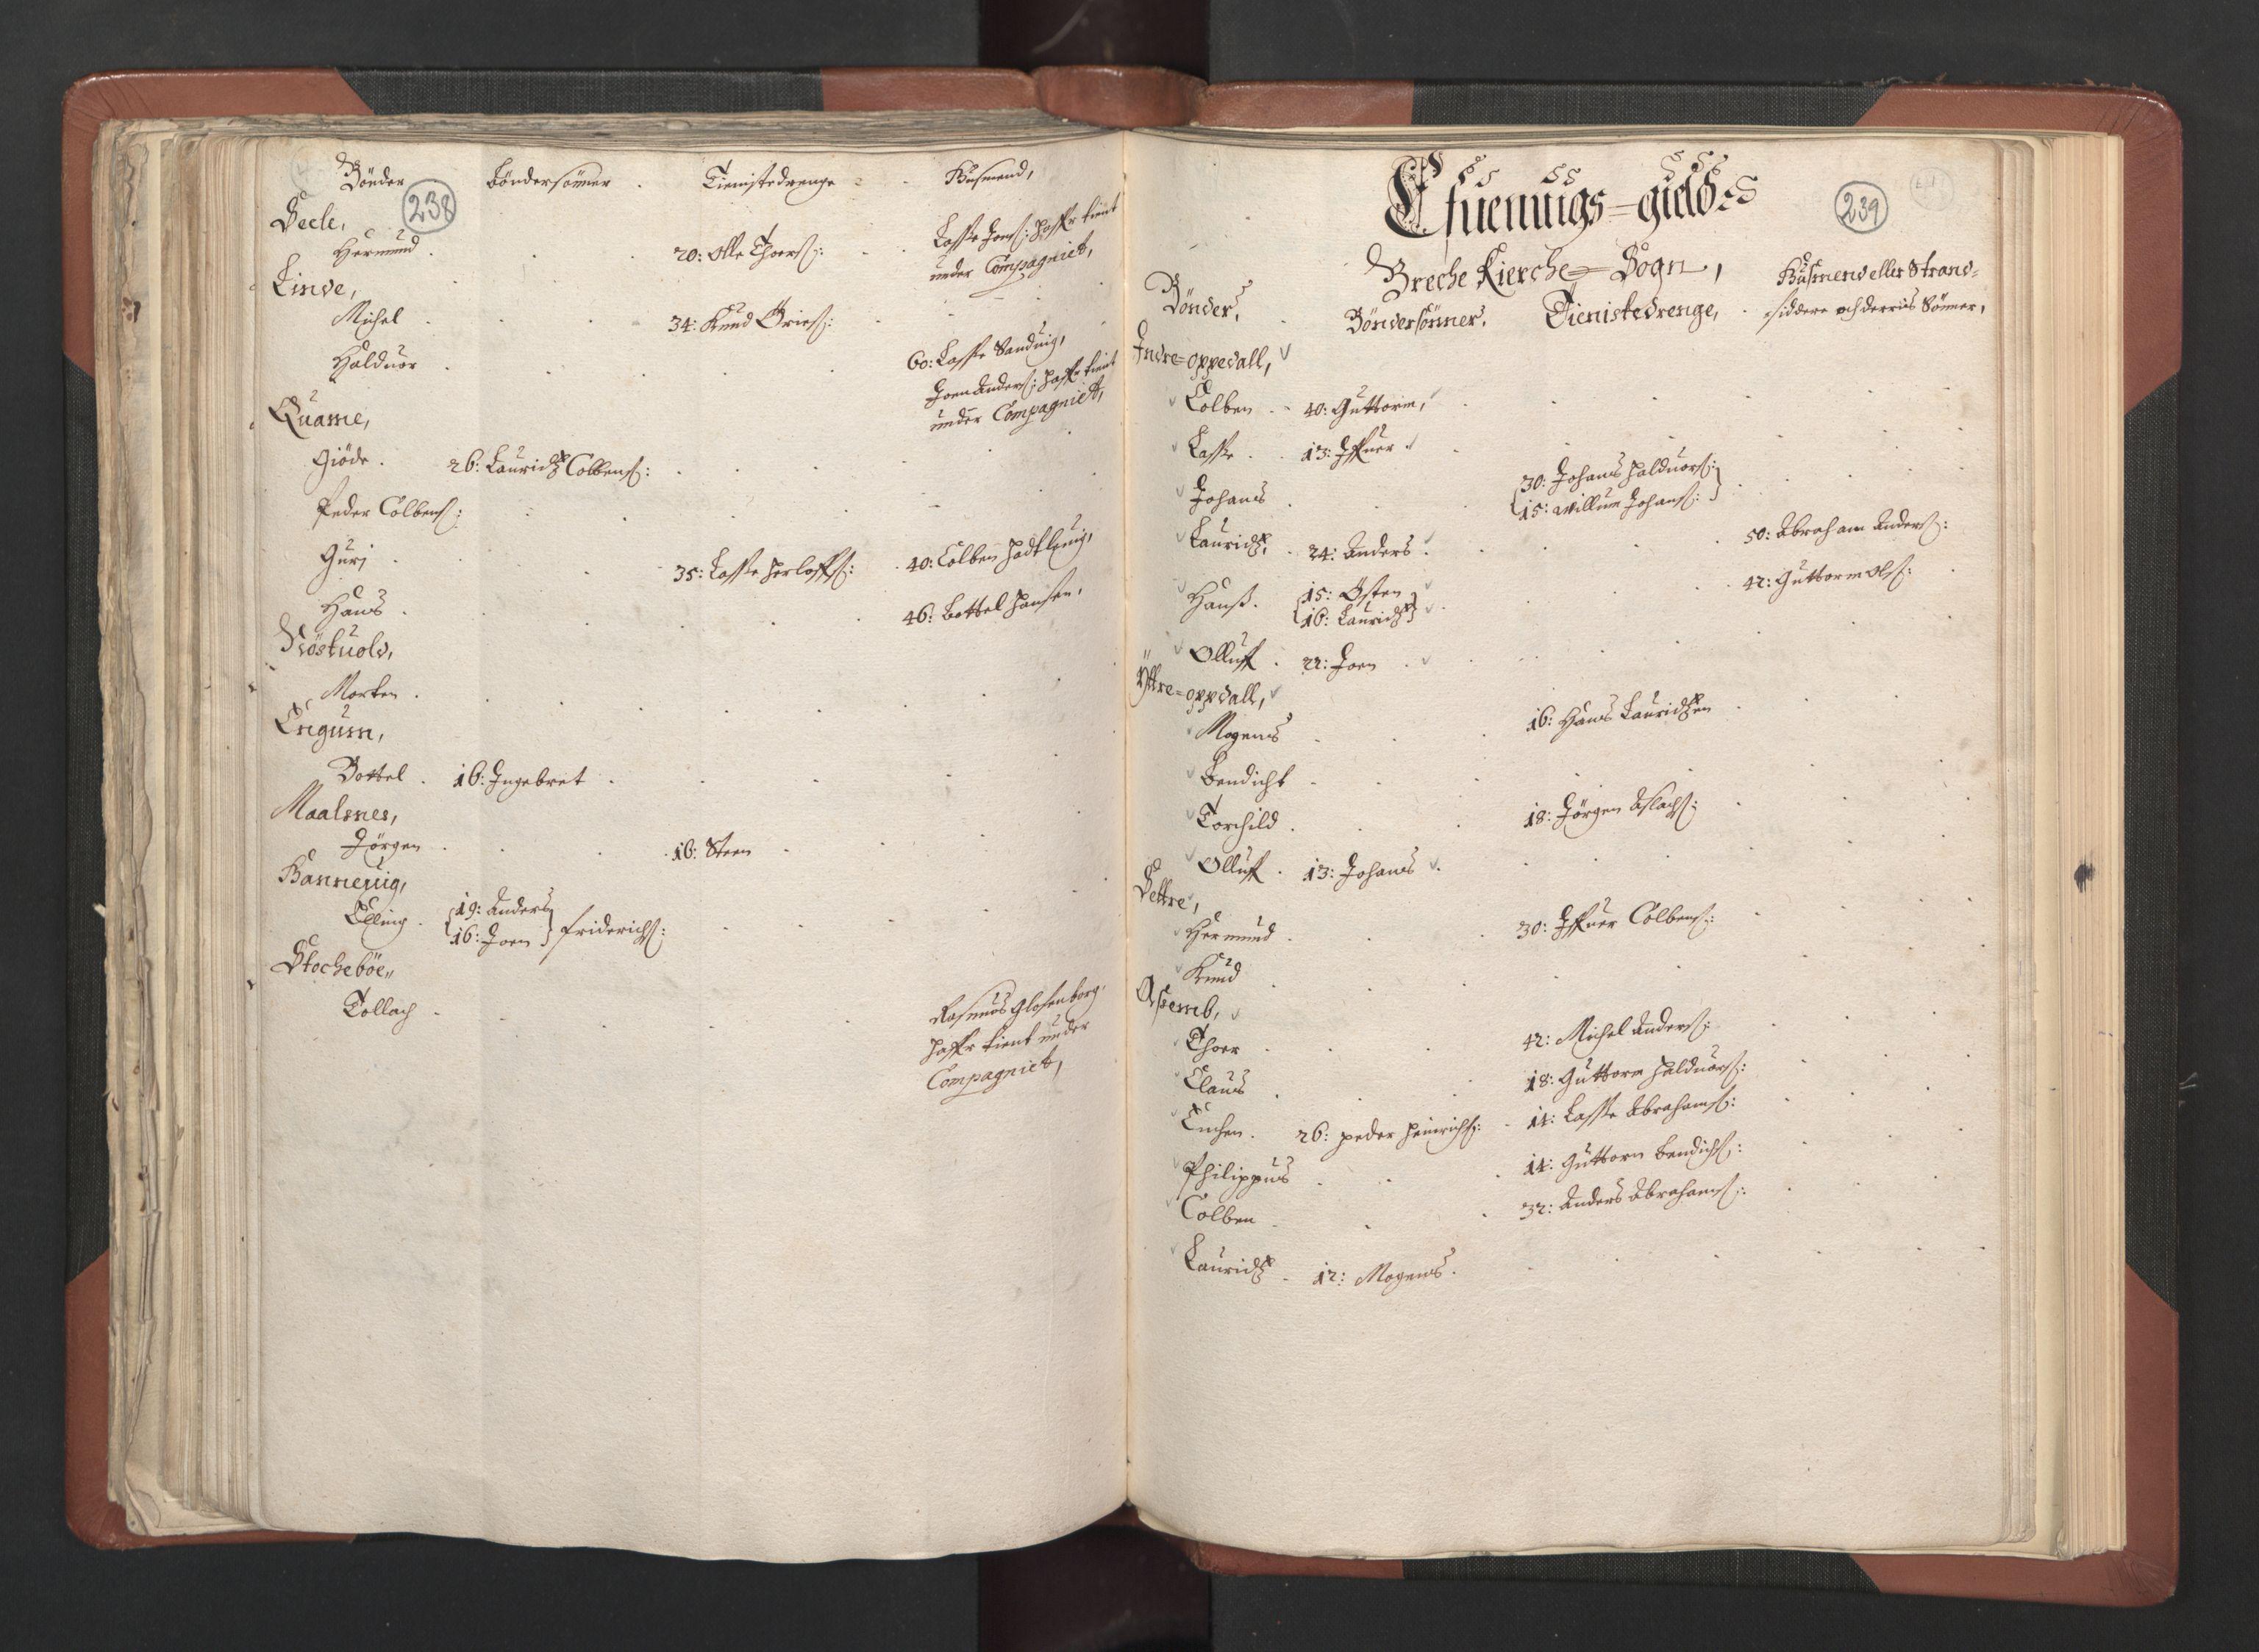 RA, Fogdenes og sorenskrivernes manntall 1664-1666, nr. 14: Hardanger len, Ytre Sogn fogderi og Indre Sogn fogderi, 1664-1665, s. 238-239